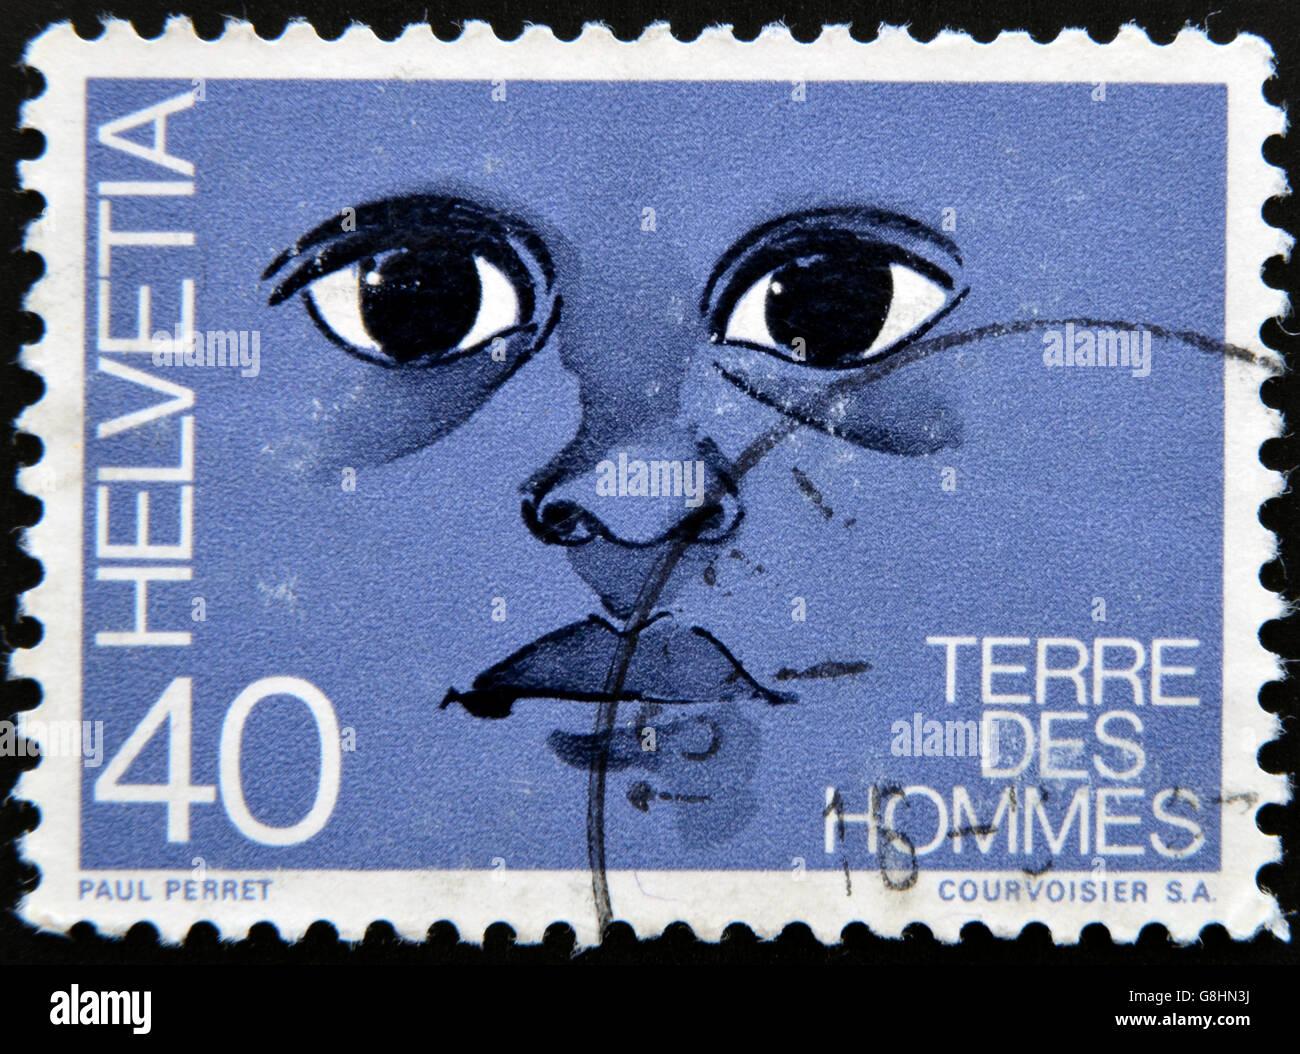 SWITZERLAND - CIRCA 1992: A stamp printed in Switzerland dedicated to international federation 'terre des hommes' - Stock Image